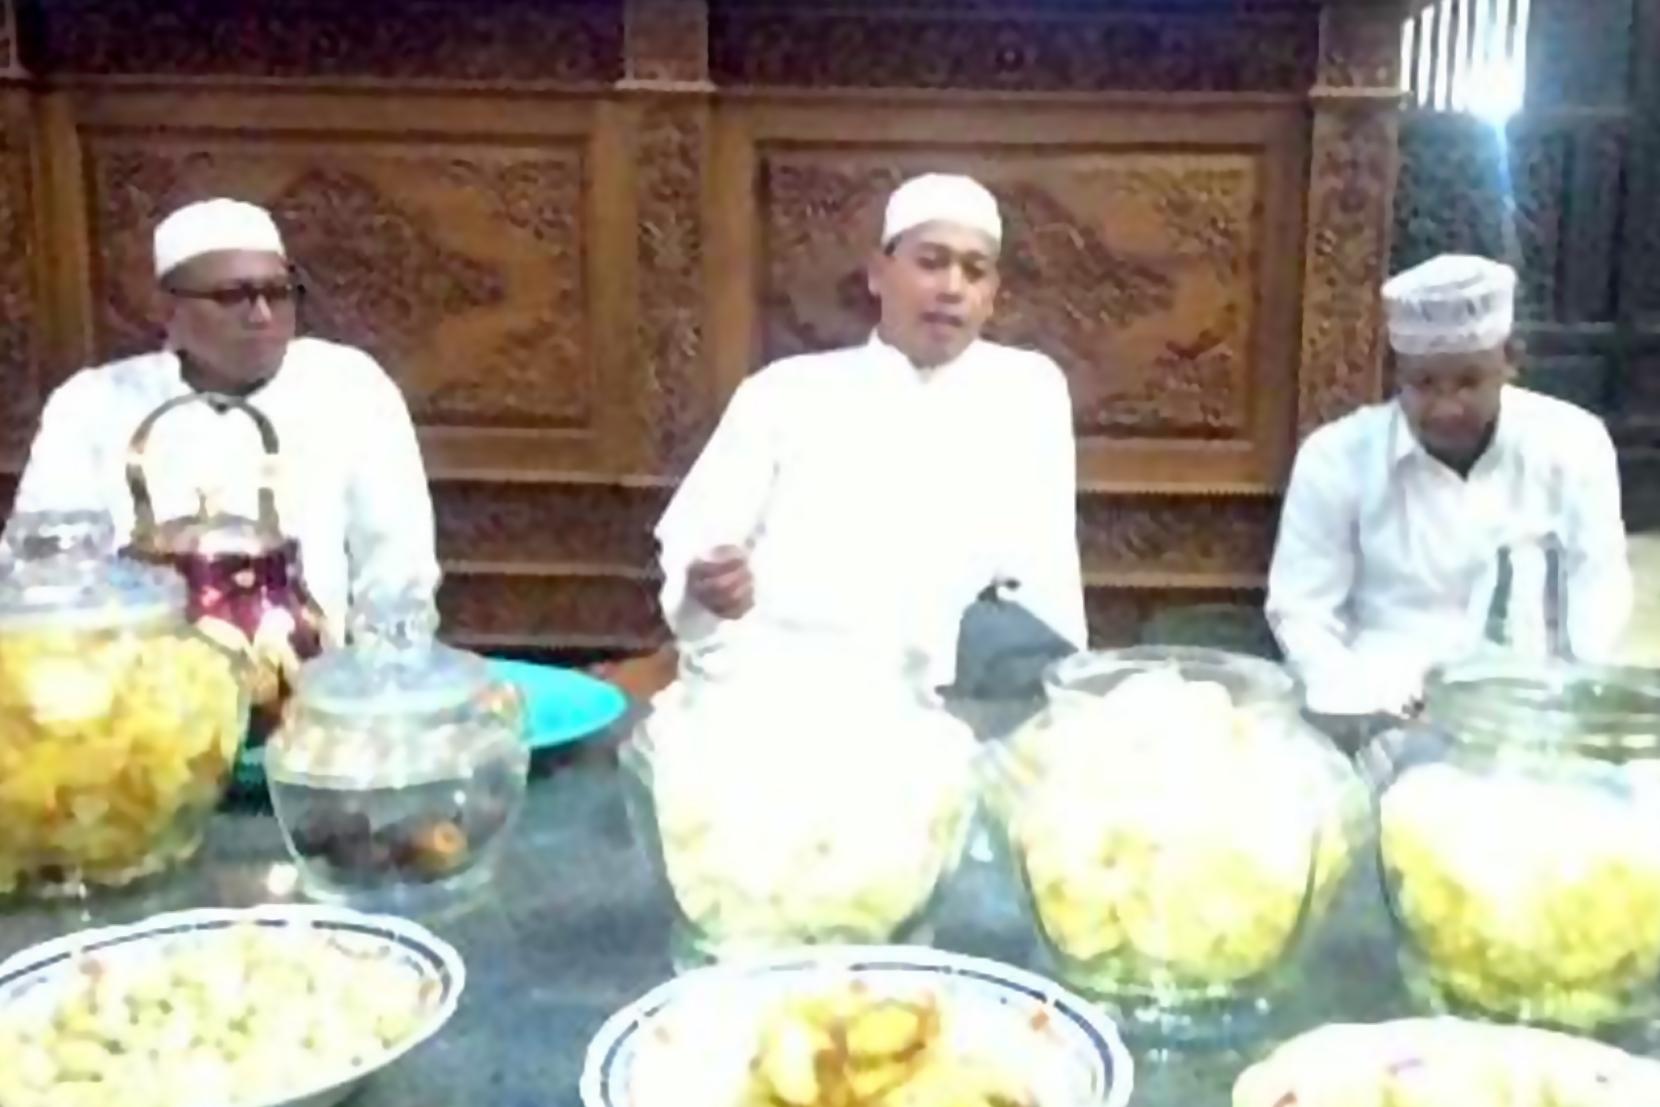 RMI-NU Kabupaten Malang